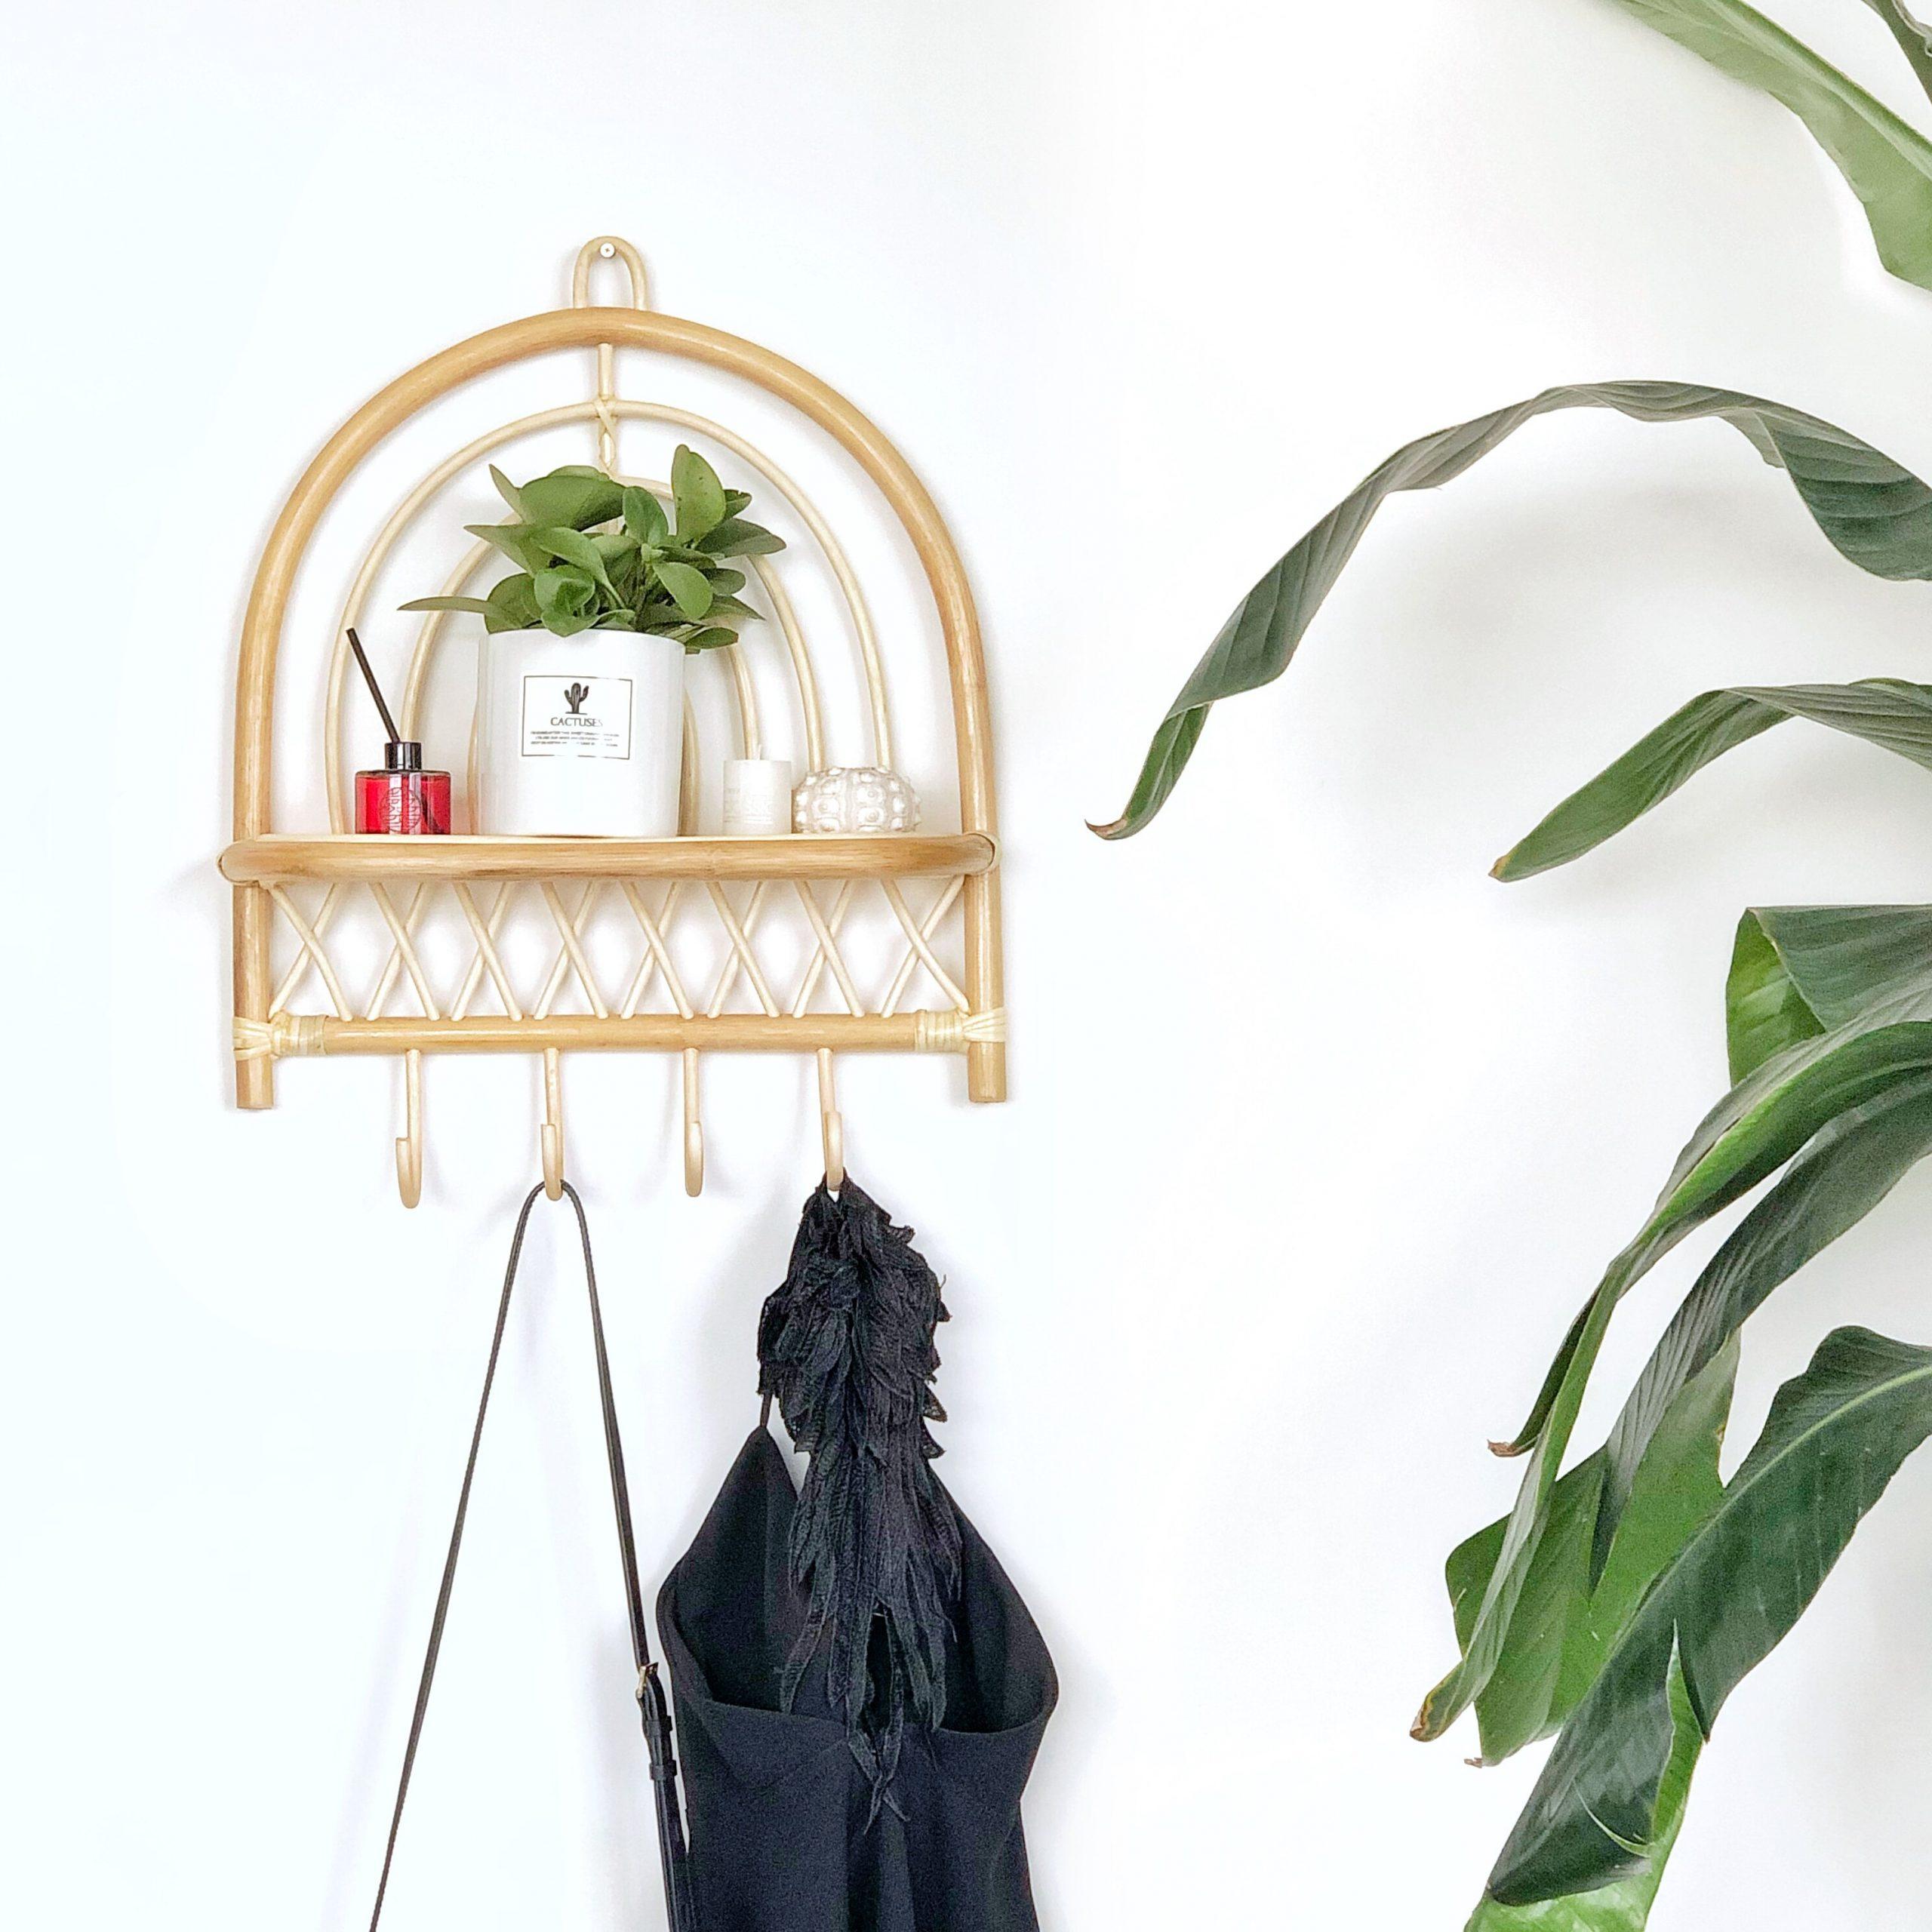 Rattan hanging rack Handmade semicircular rattan wall decoration rack with hook